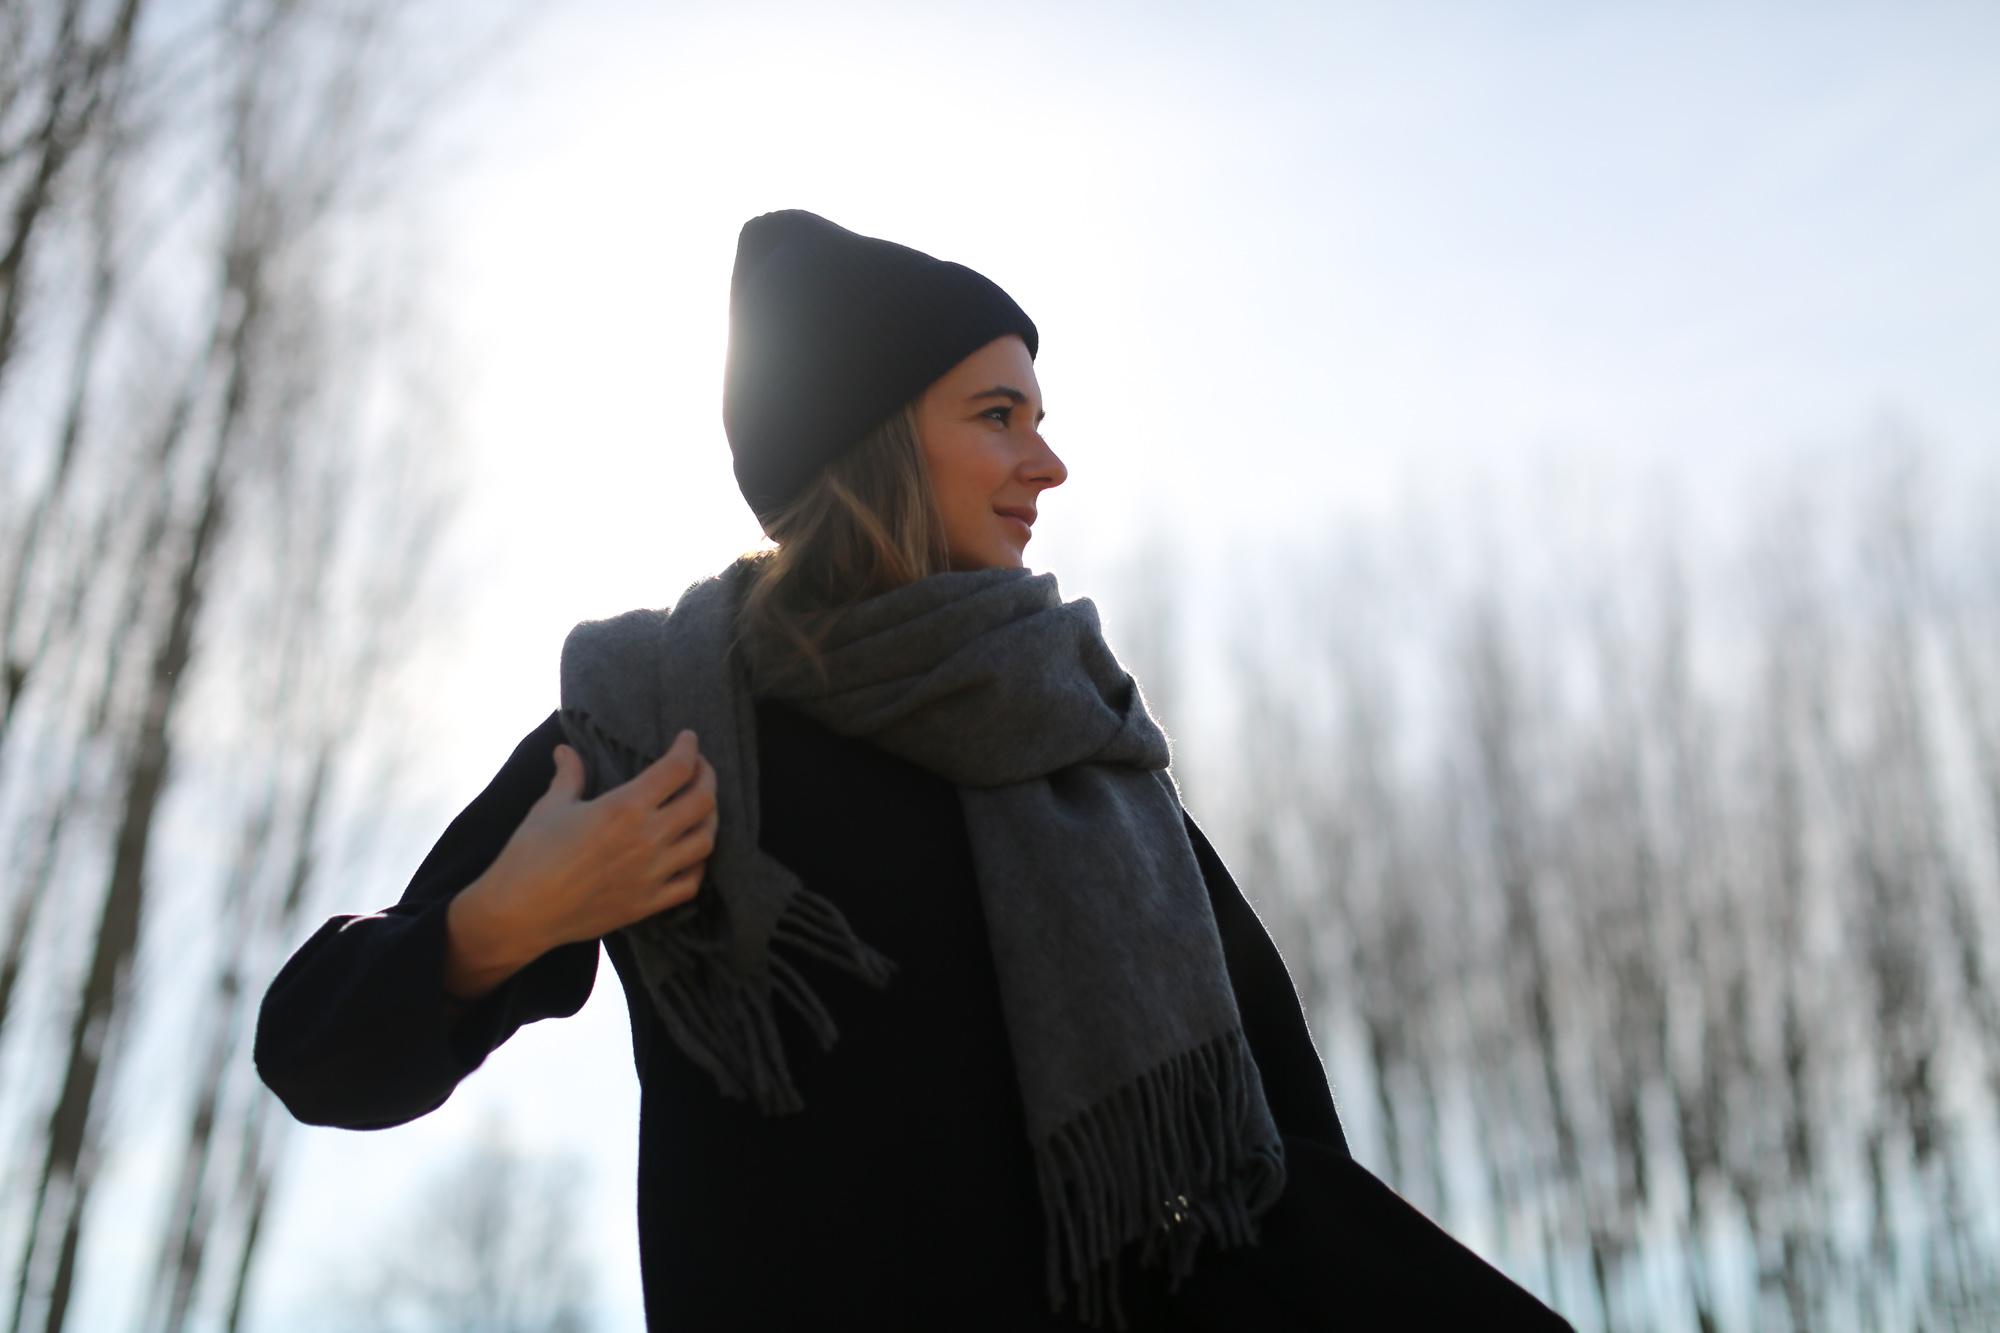 Clochet_streetstyle_maje_trousers_adidas_stan_smith_cos_coat_acne_studios_canada_scarf-1-12